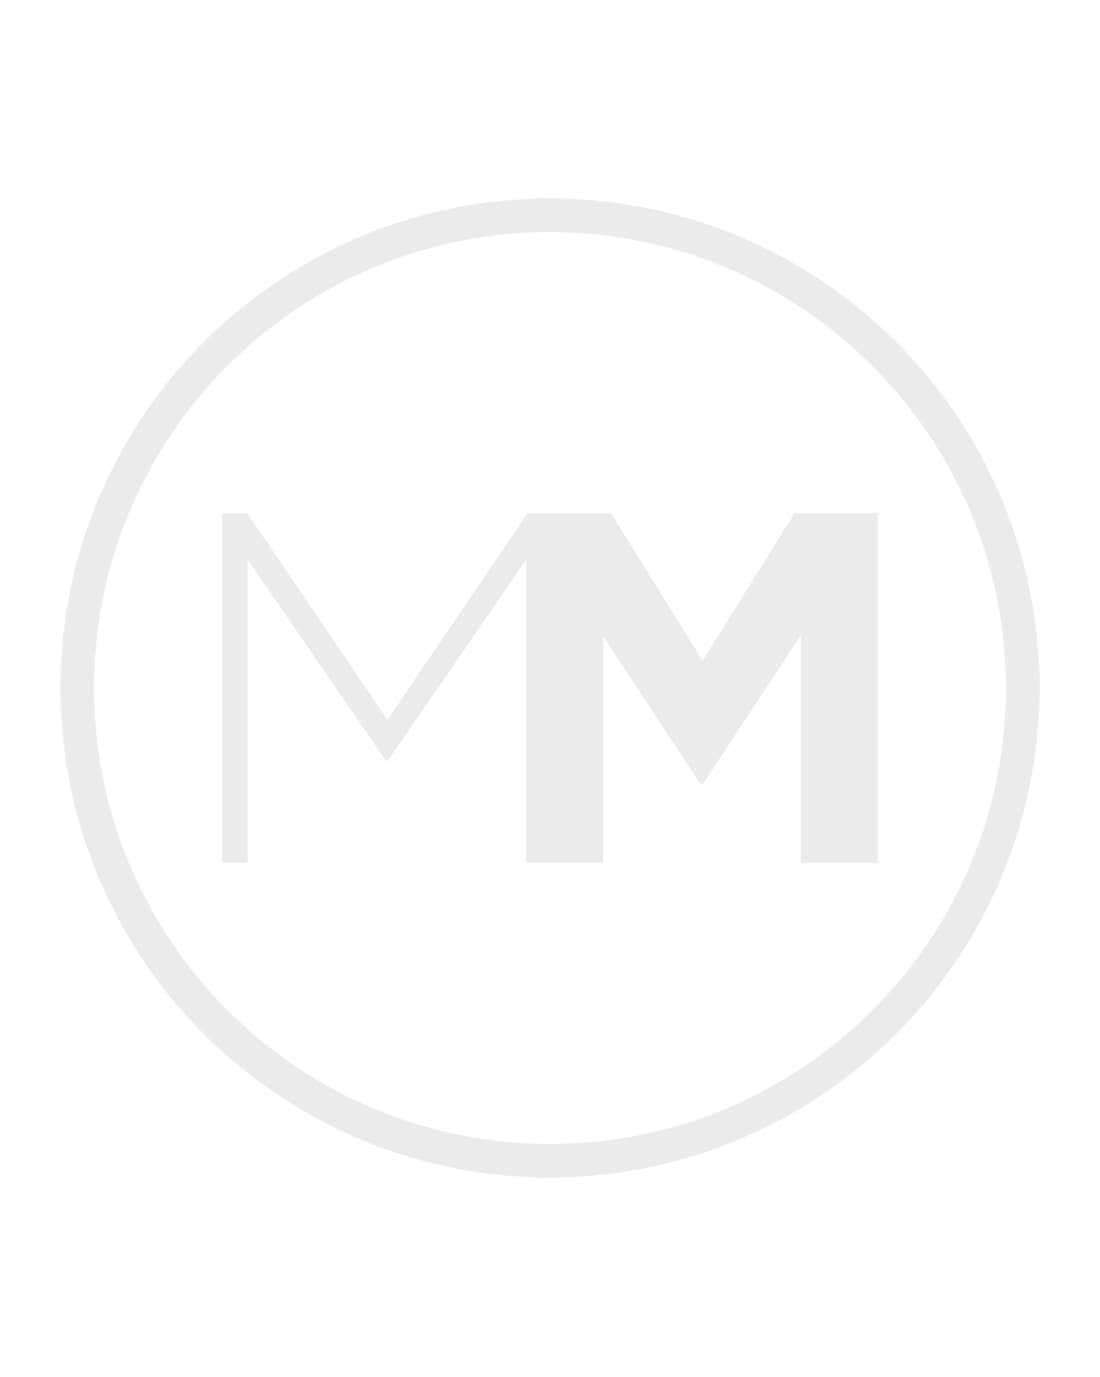 Kocca Teman jurk wit blauw dessin